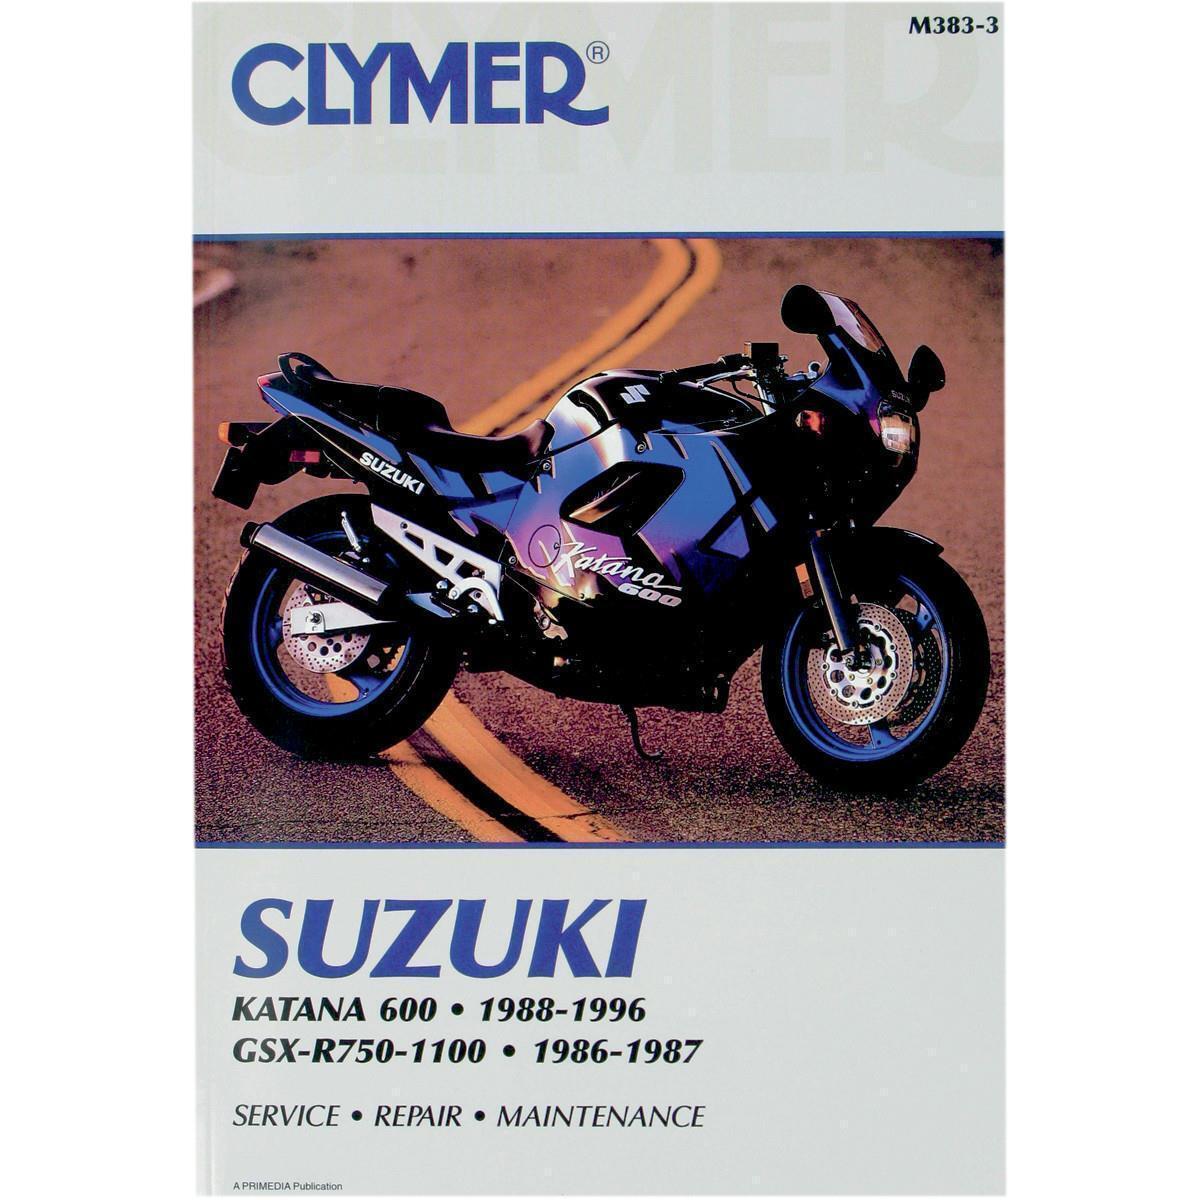 clymer m383 3 repair manual ebay rh ebay com au Suzuki Katana 750 Suzuki Ninja